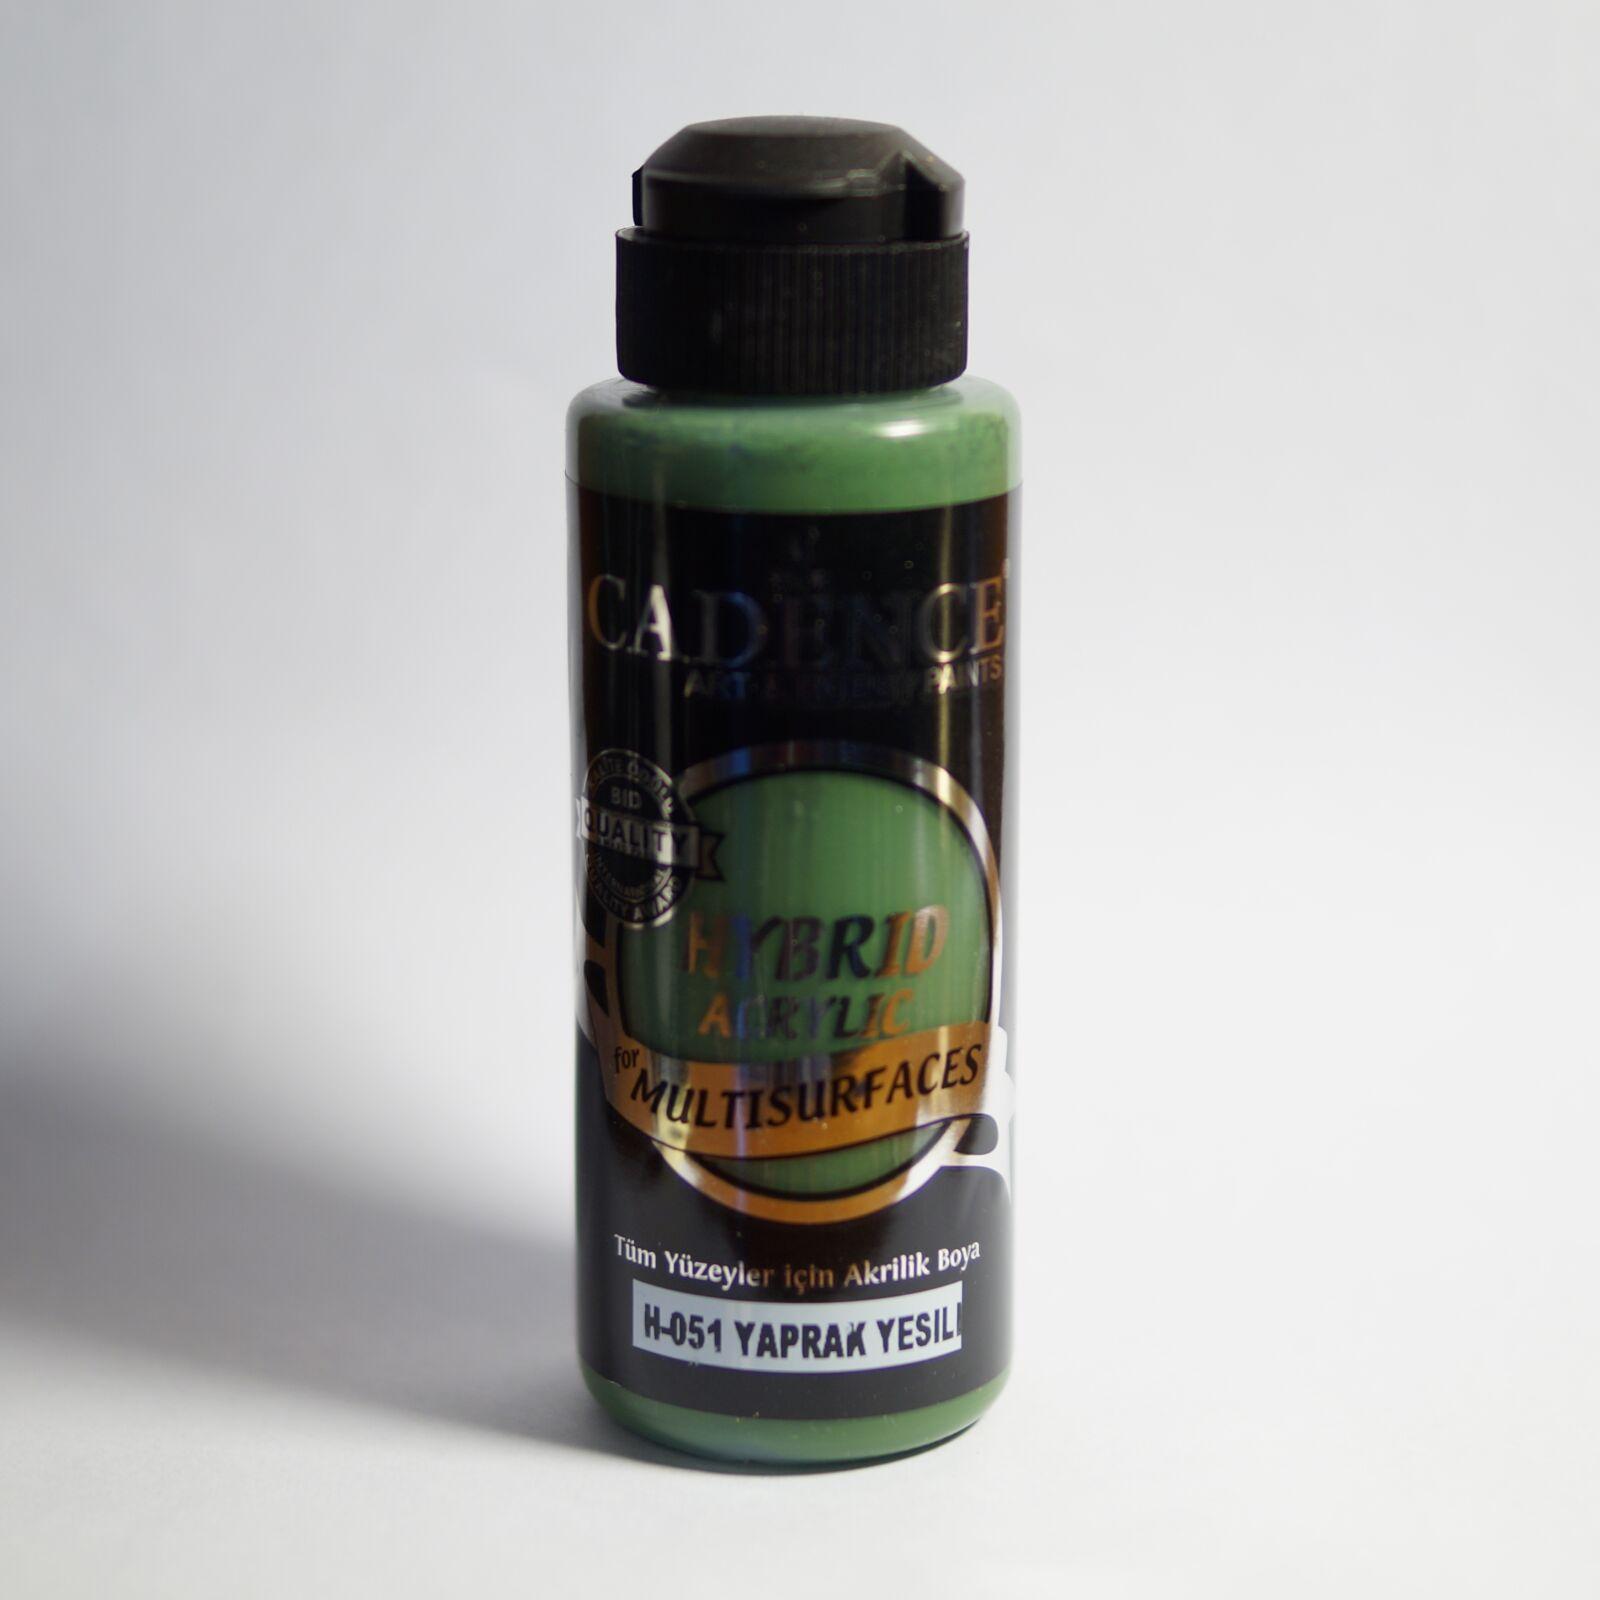 HYBRID Akrilfesték [Leaf Green] 120 ml